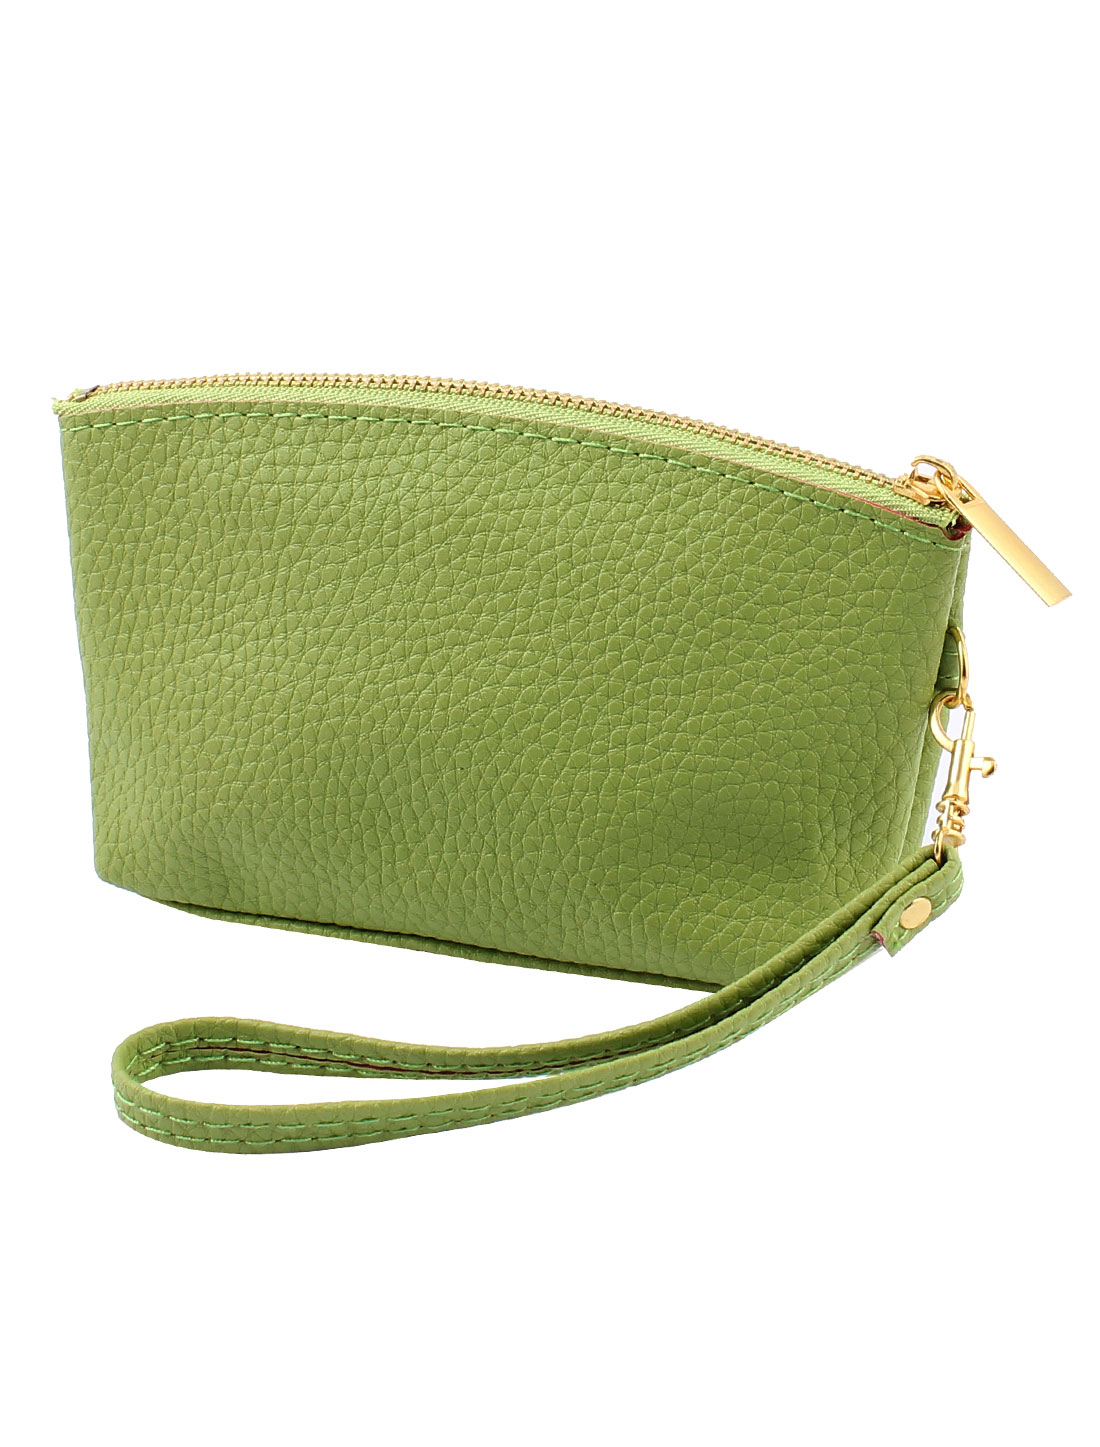 PU Leather Zipper Closure Coin Bag Purse Wallet Card Holder Green